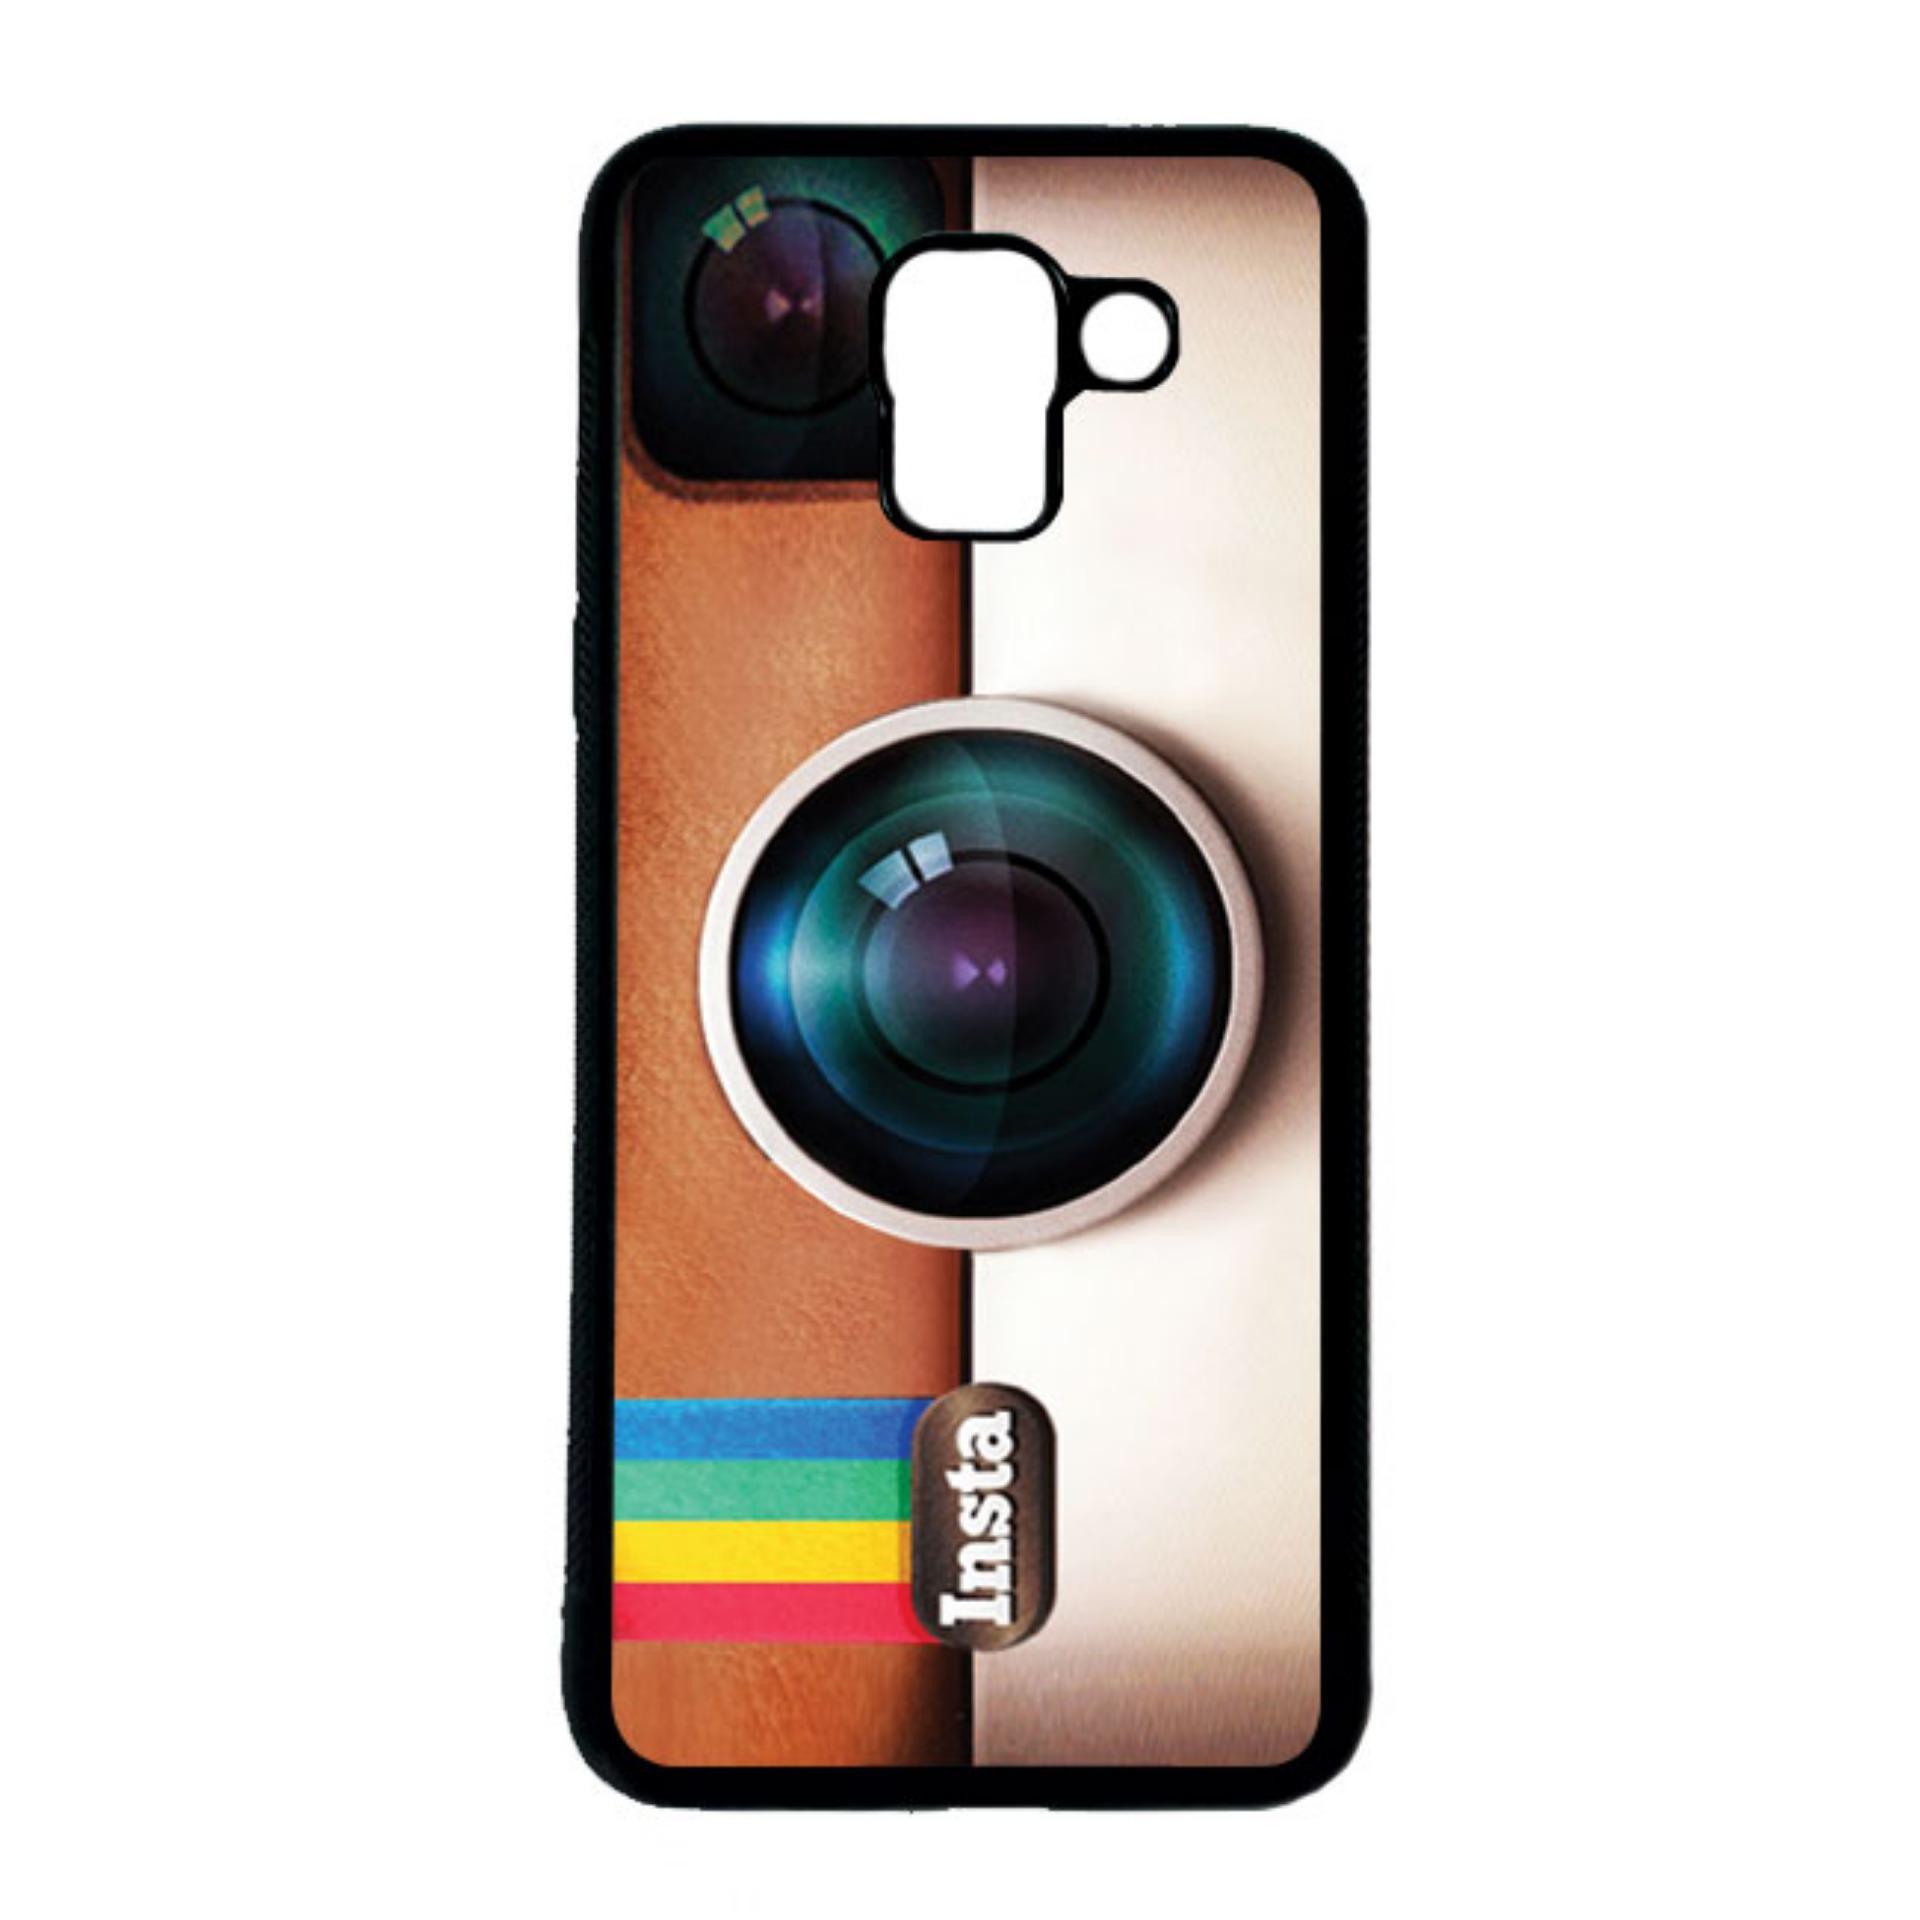 HEAVENCASE Casing Case Samsung Galaxy J6 Case Softcase Hitam Motif Unik Instagram